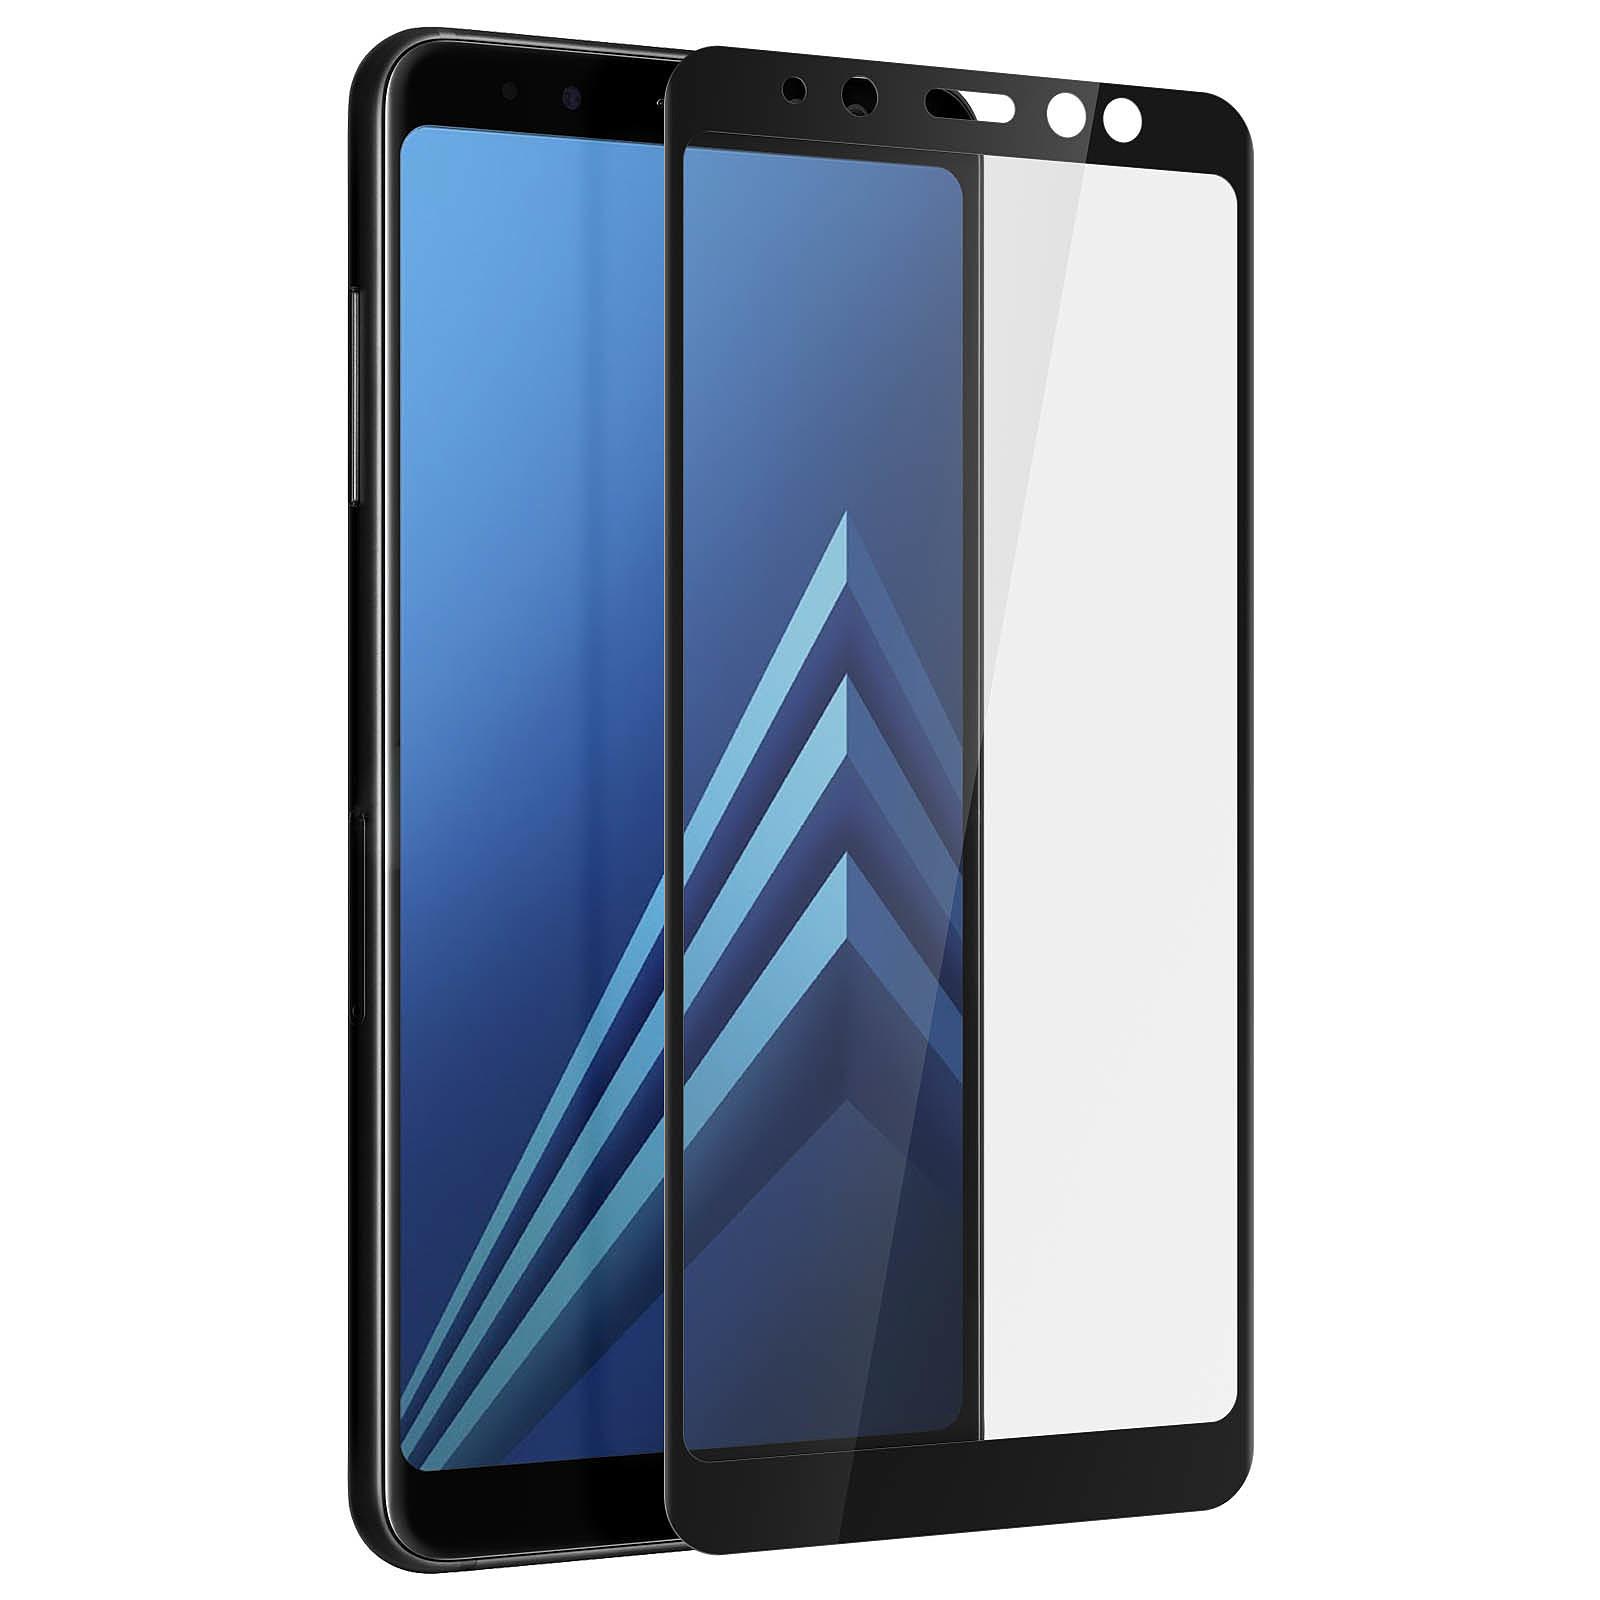 Avizar Film verre trempé Noir pour Samsung Galaxy A8